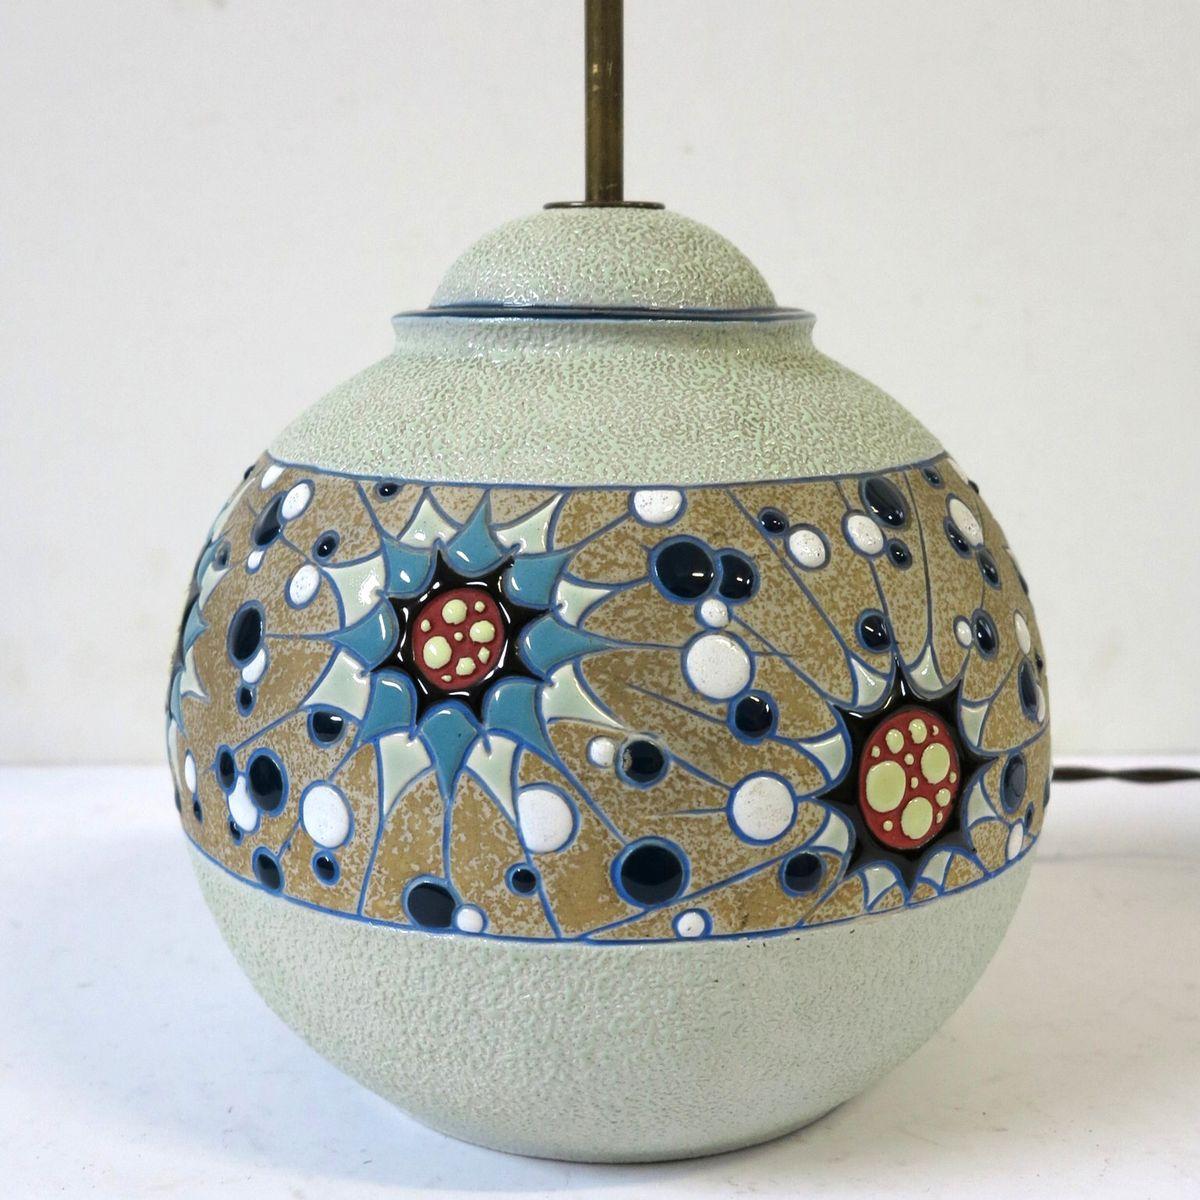 art deco keramik lampe von amphora 1930er bei pamono kaufen. Black Bedroom Furniture Sets. Home Design Ideas